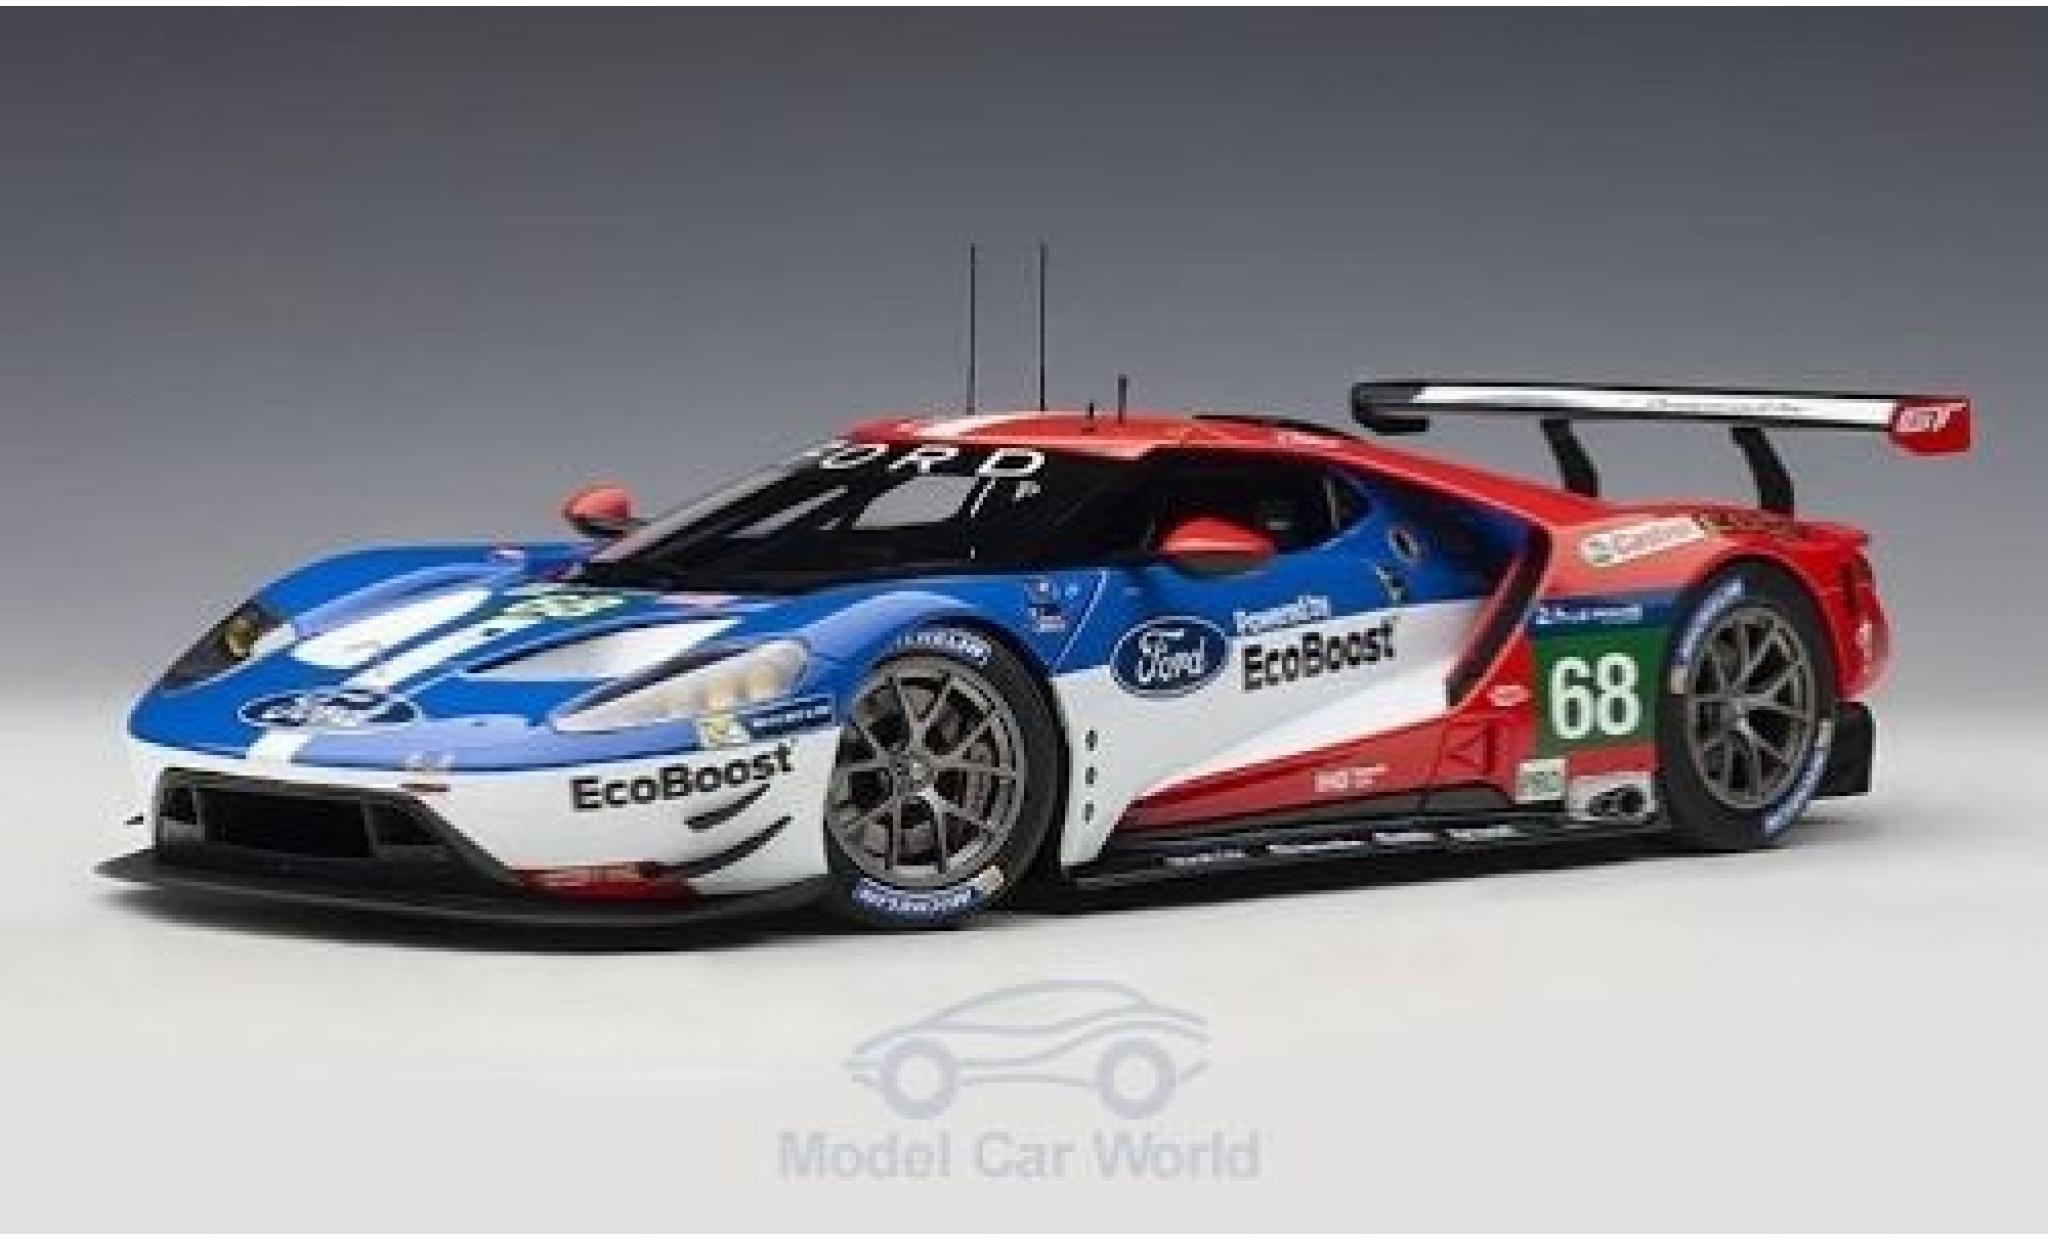 Ford GT 1/18 AUTOart No.68 Chip Ganassi Racing USA 24h Le Mans 2016 J.Hand/D.Müller/S.Bourdais